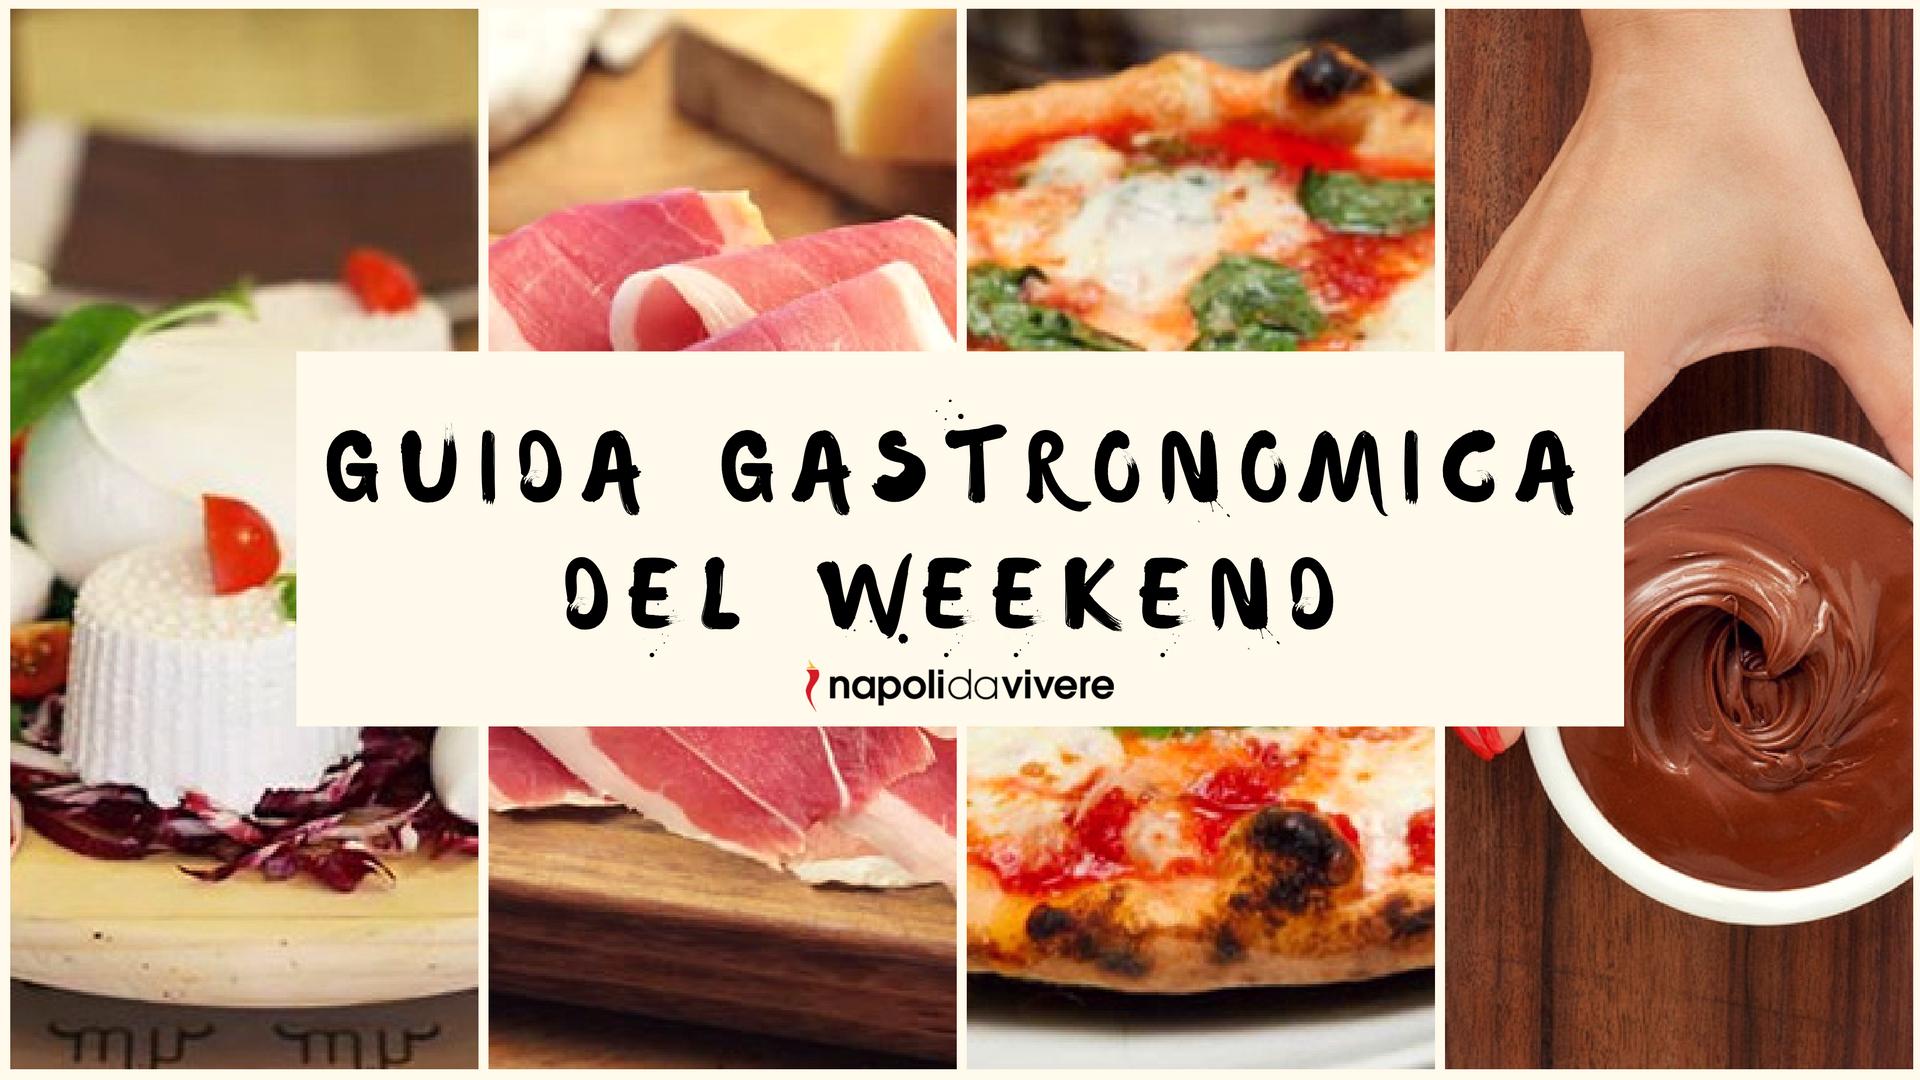 la-guida-gastronomica-del-weekend-a-napoli-29-30-ottobre-2016